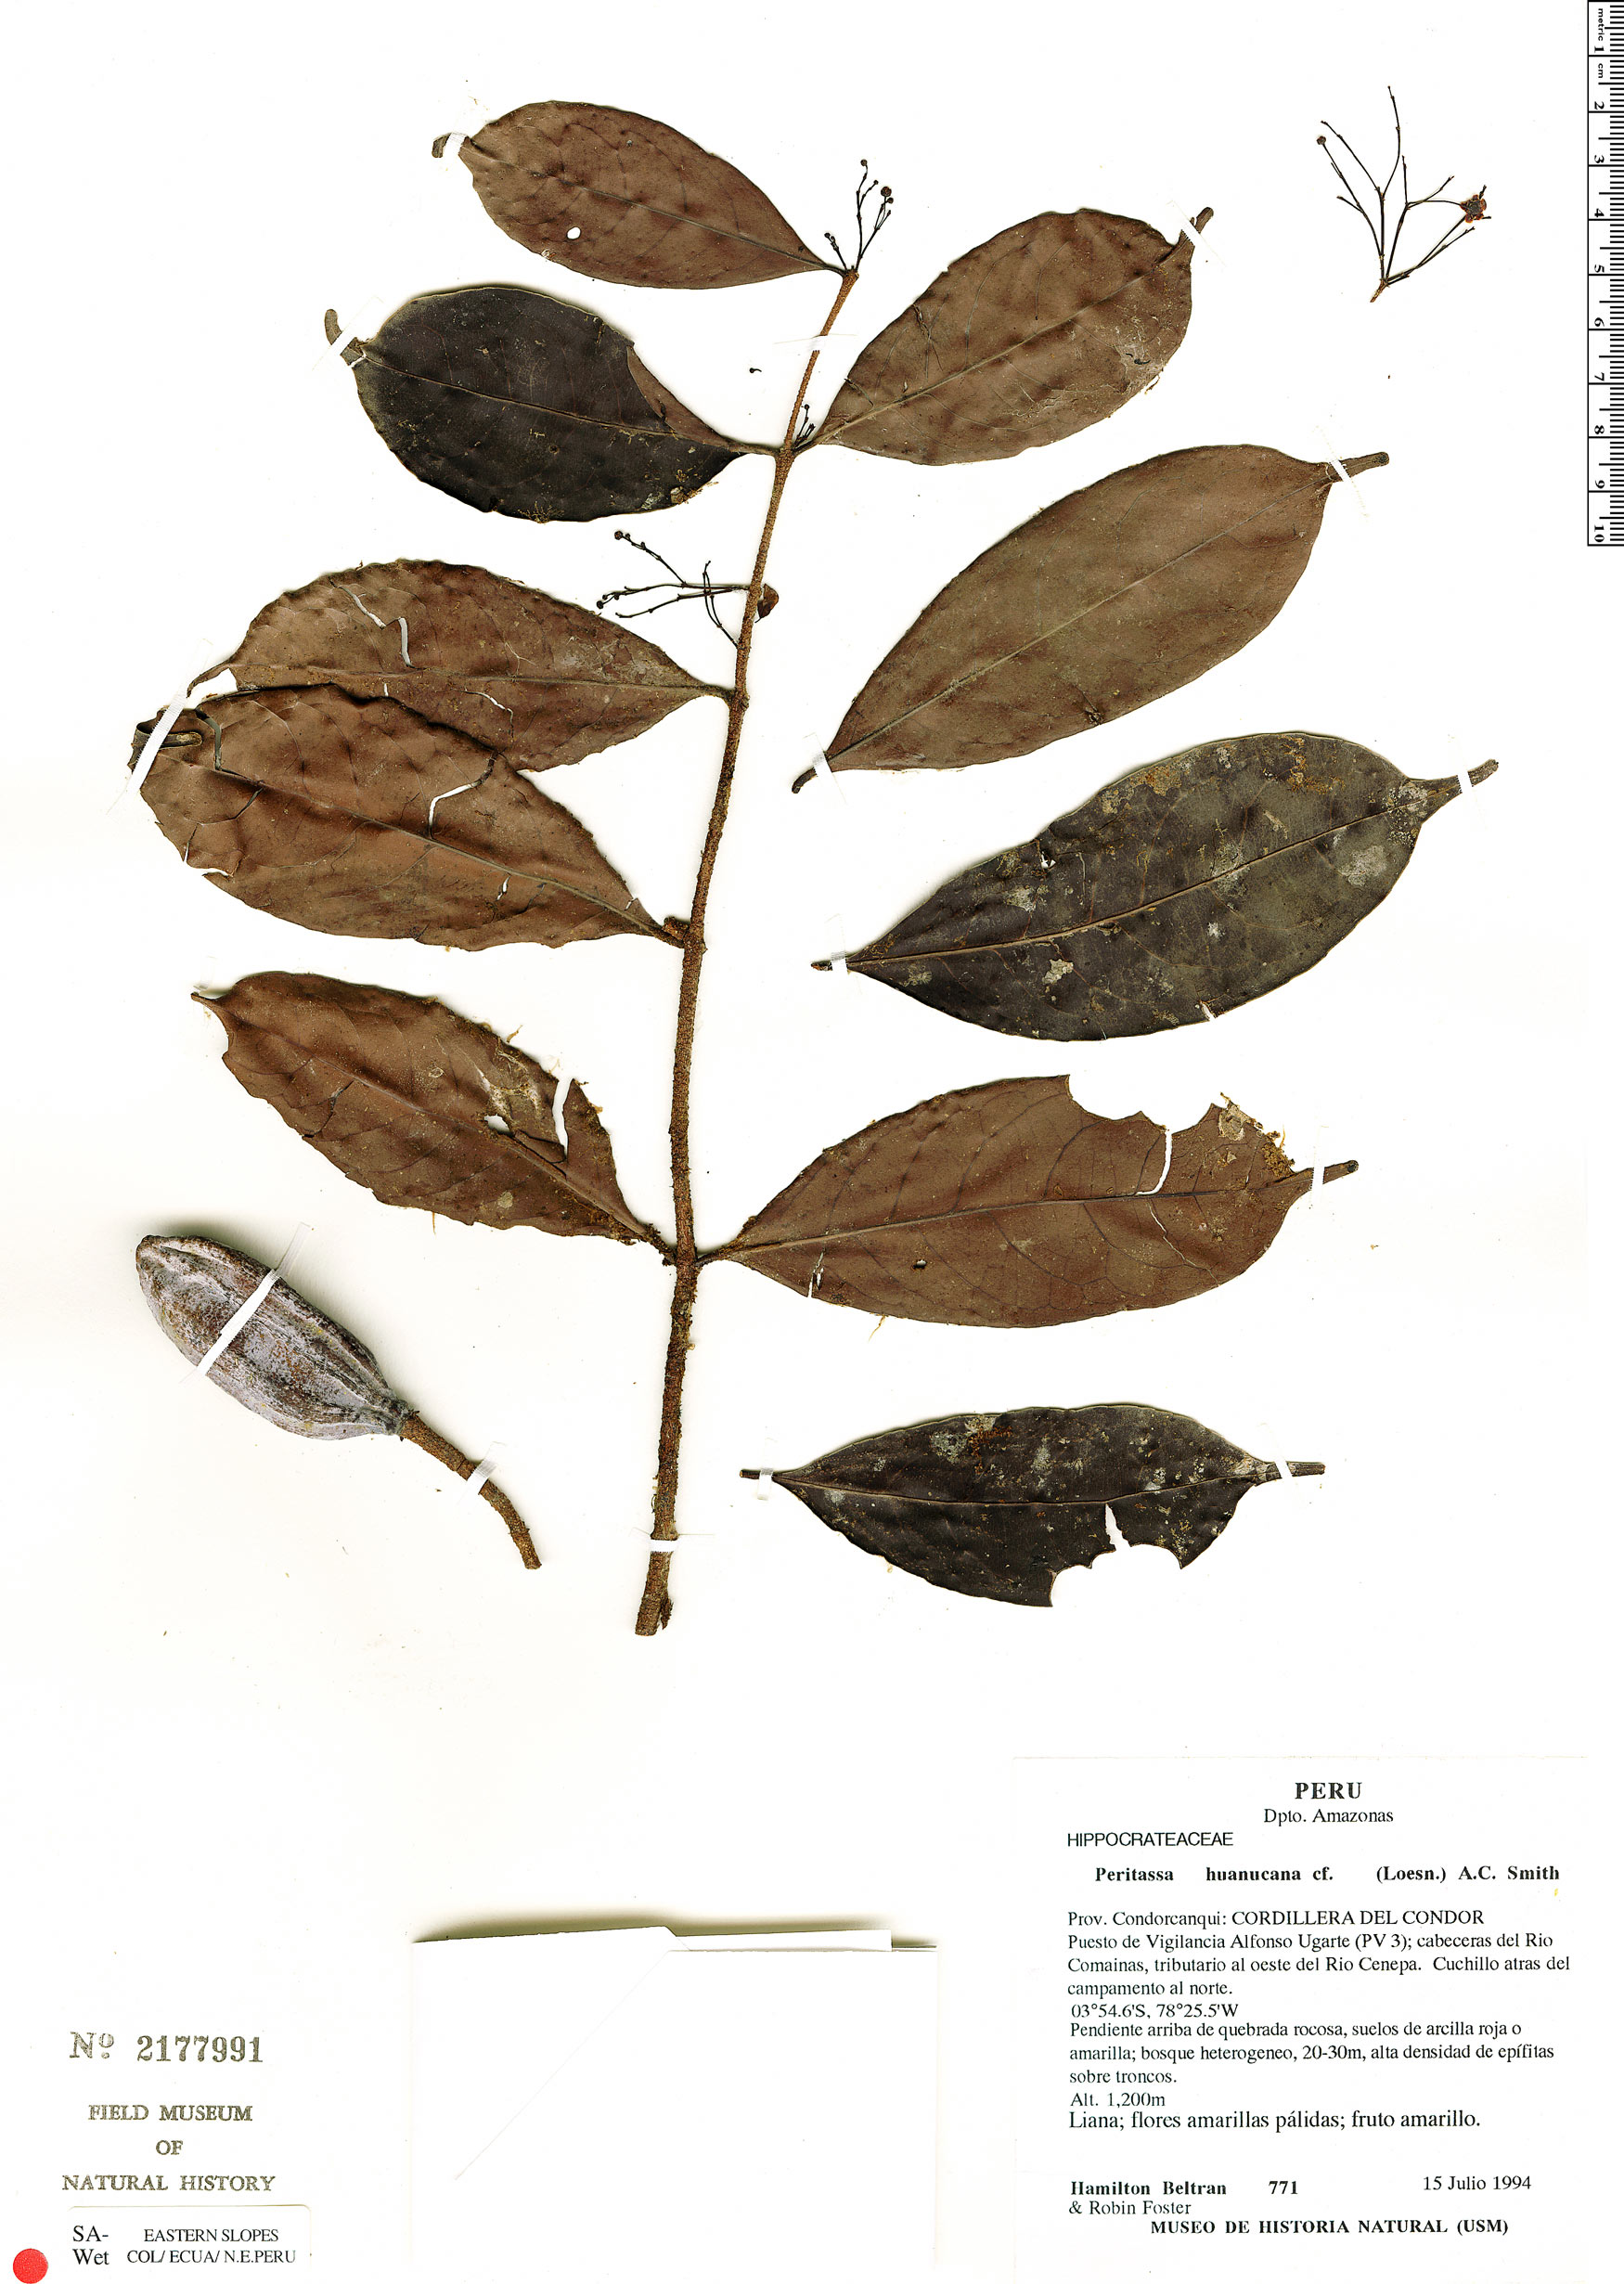 Espécimen: Peritassa huanucana